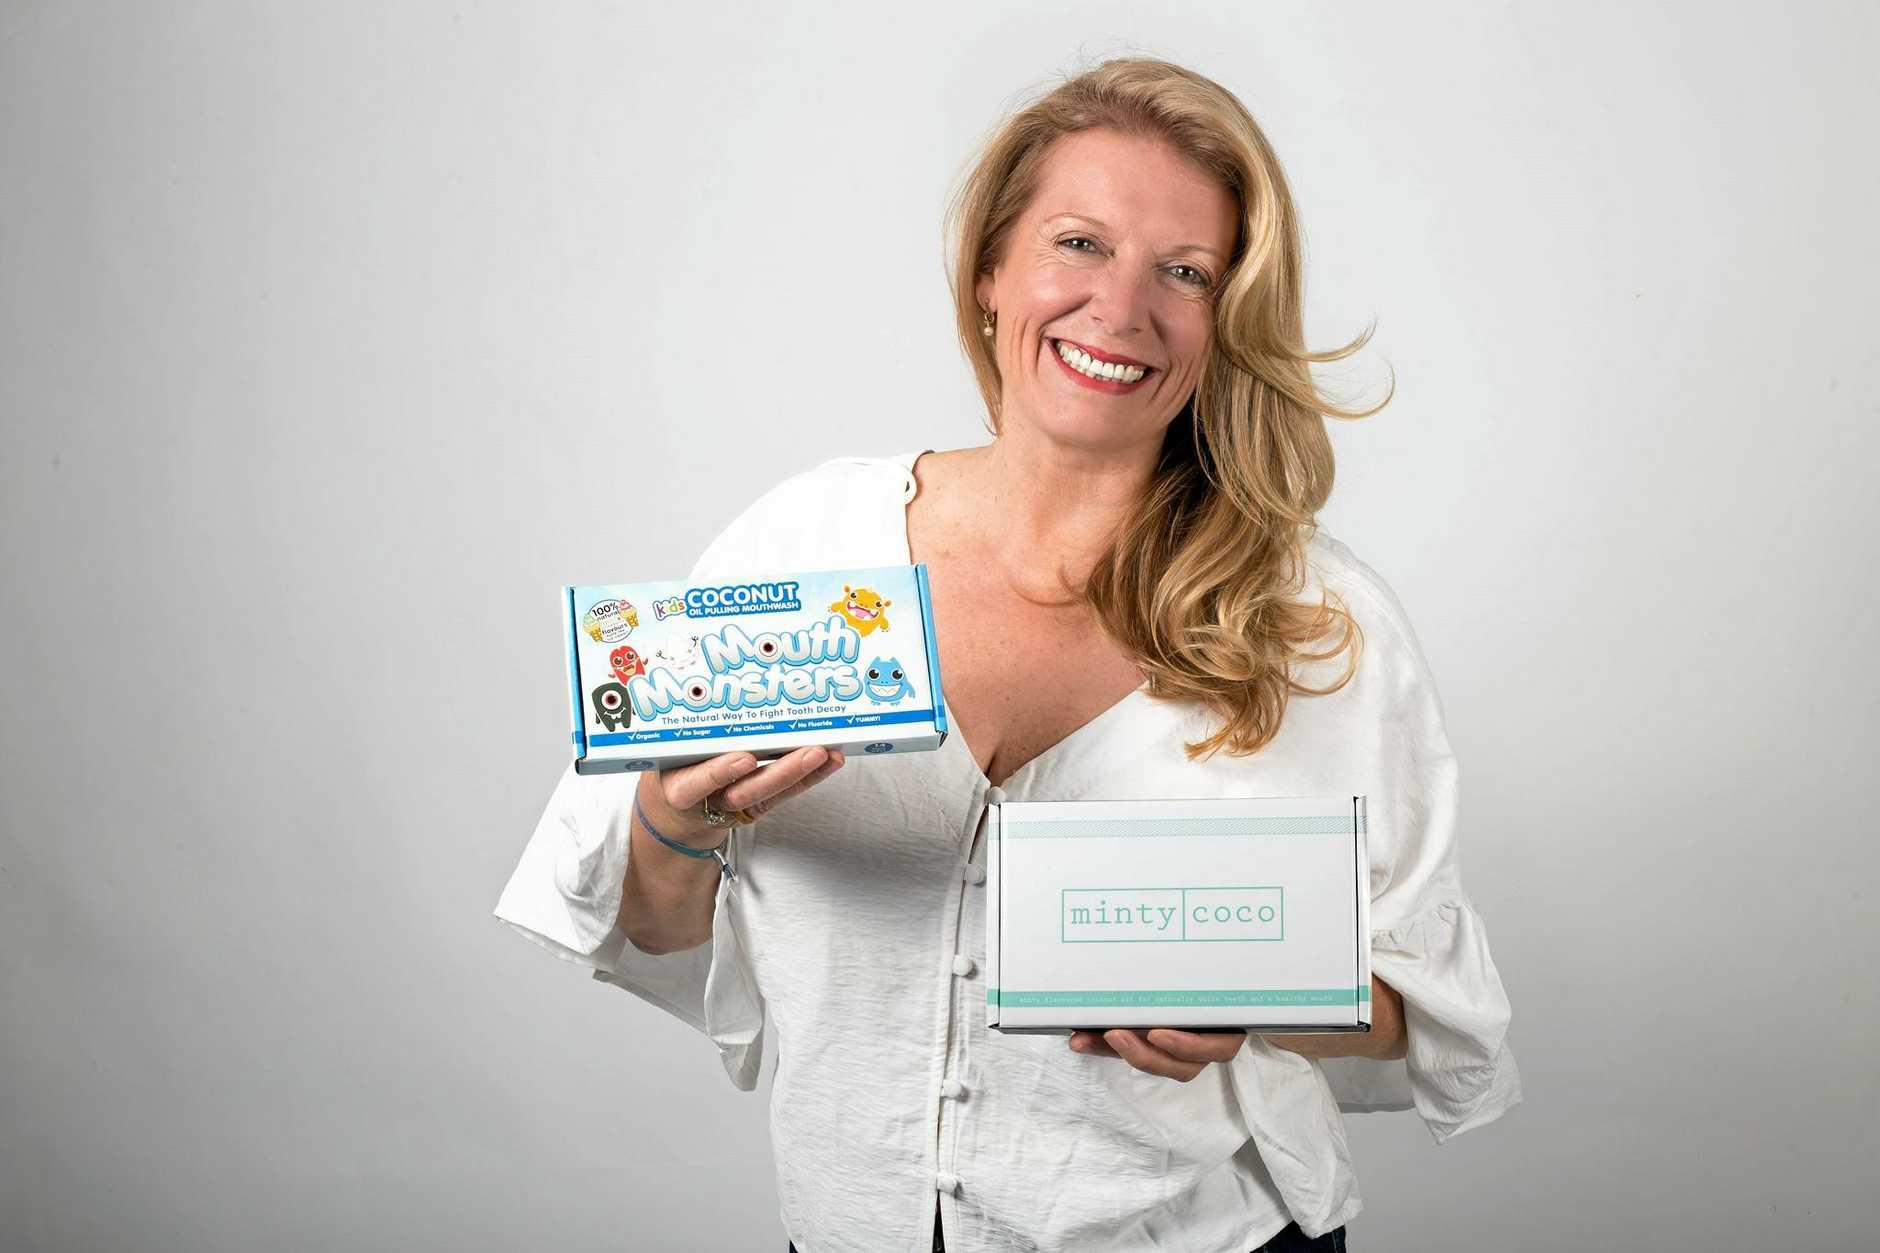 MintyCoco co-founder Angela Wright.